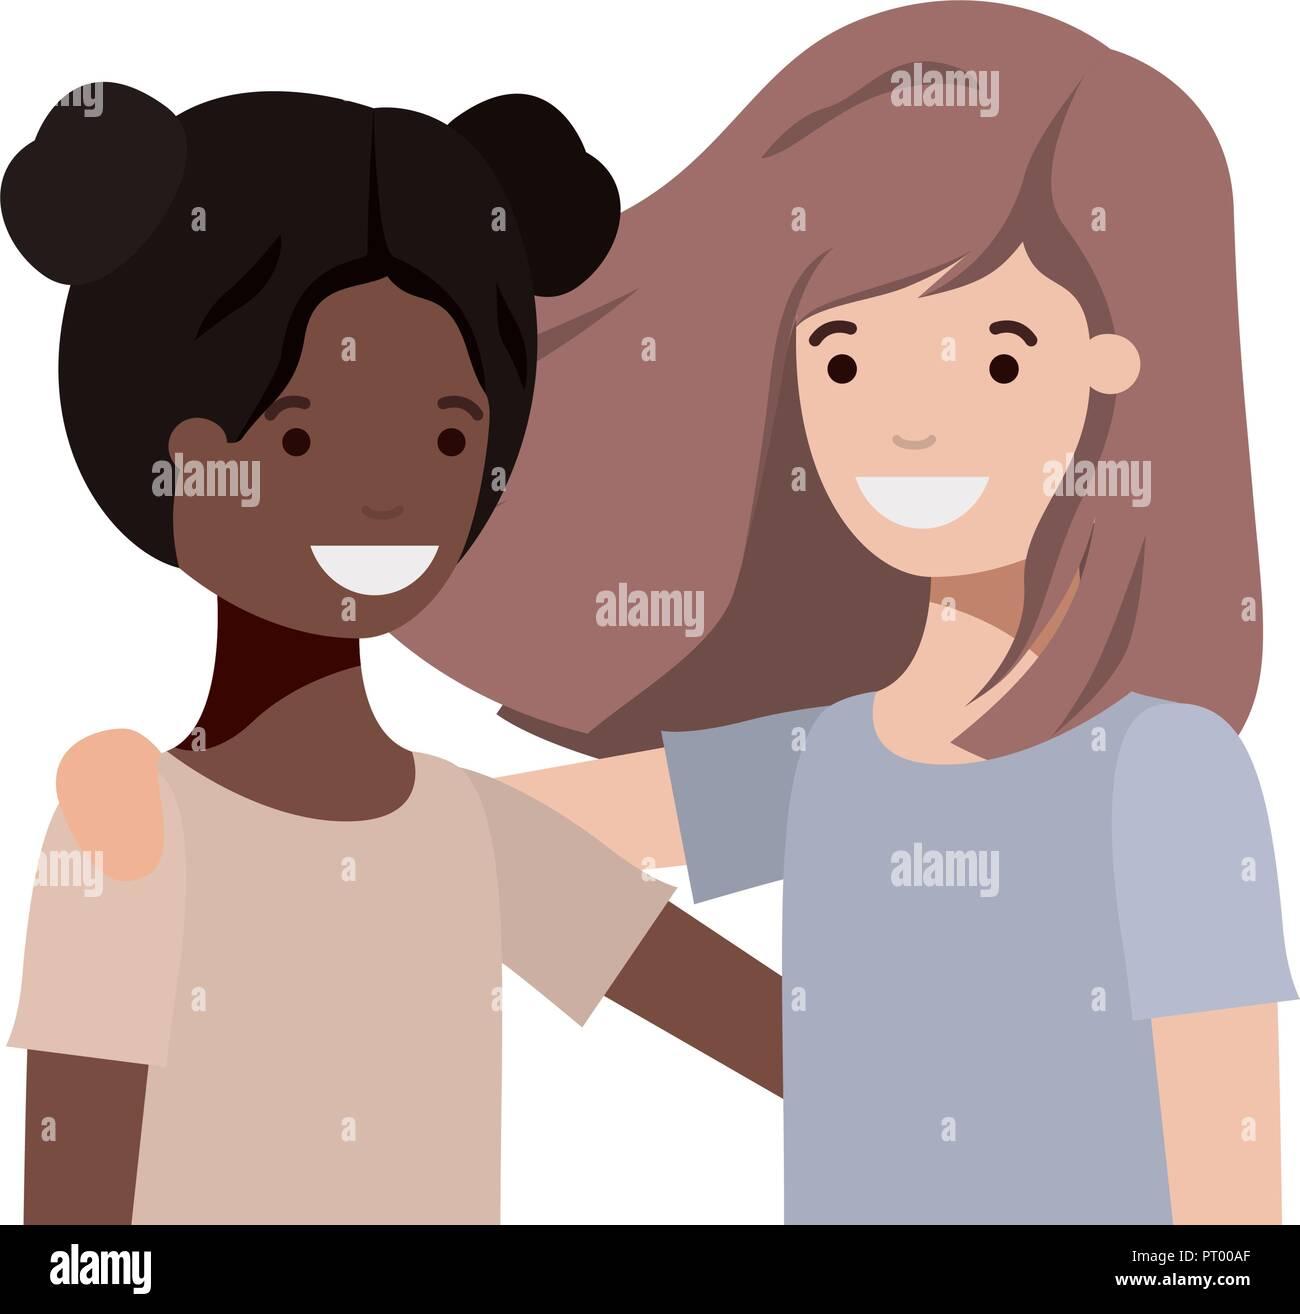 Las niñas adolescentes amigable etnia caracteres Imagen De Stock